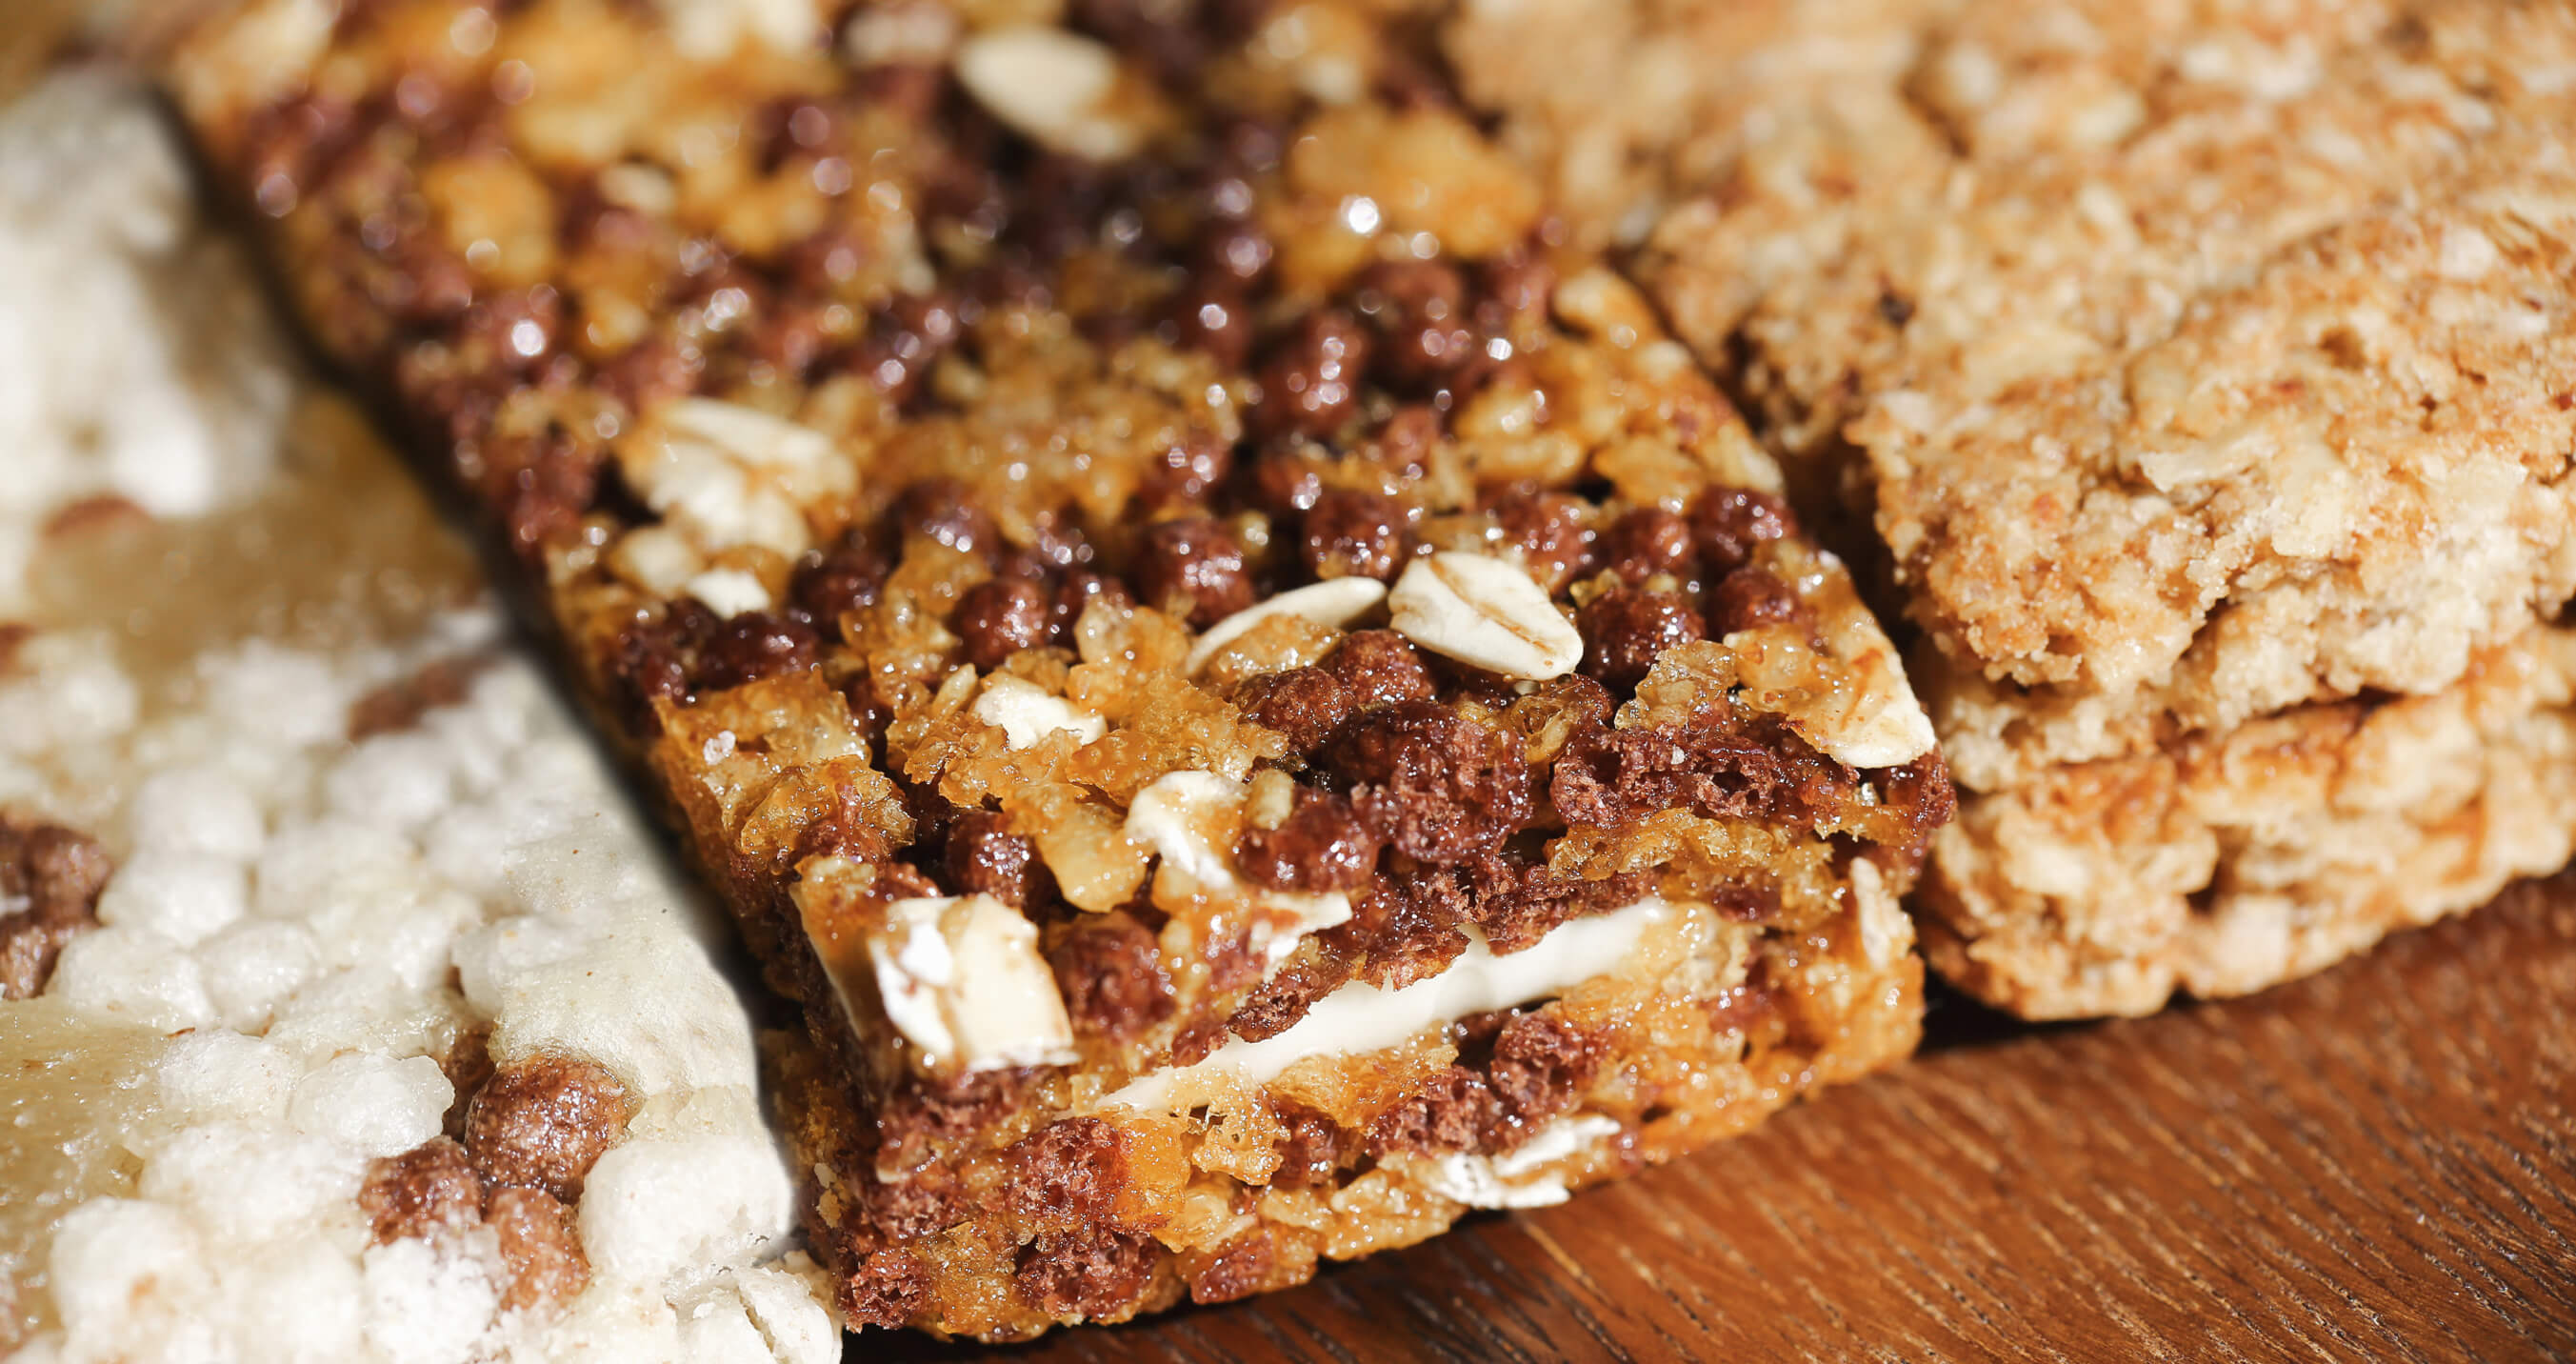 Snack bar nutrition improved with Grande WPCrisp Whey Protein Crisp